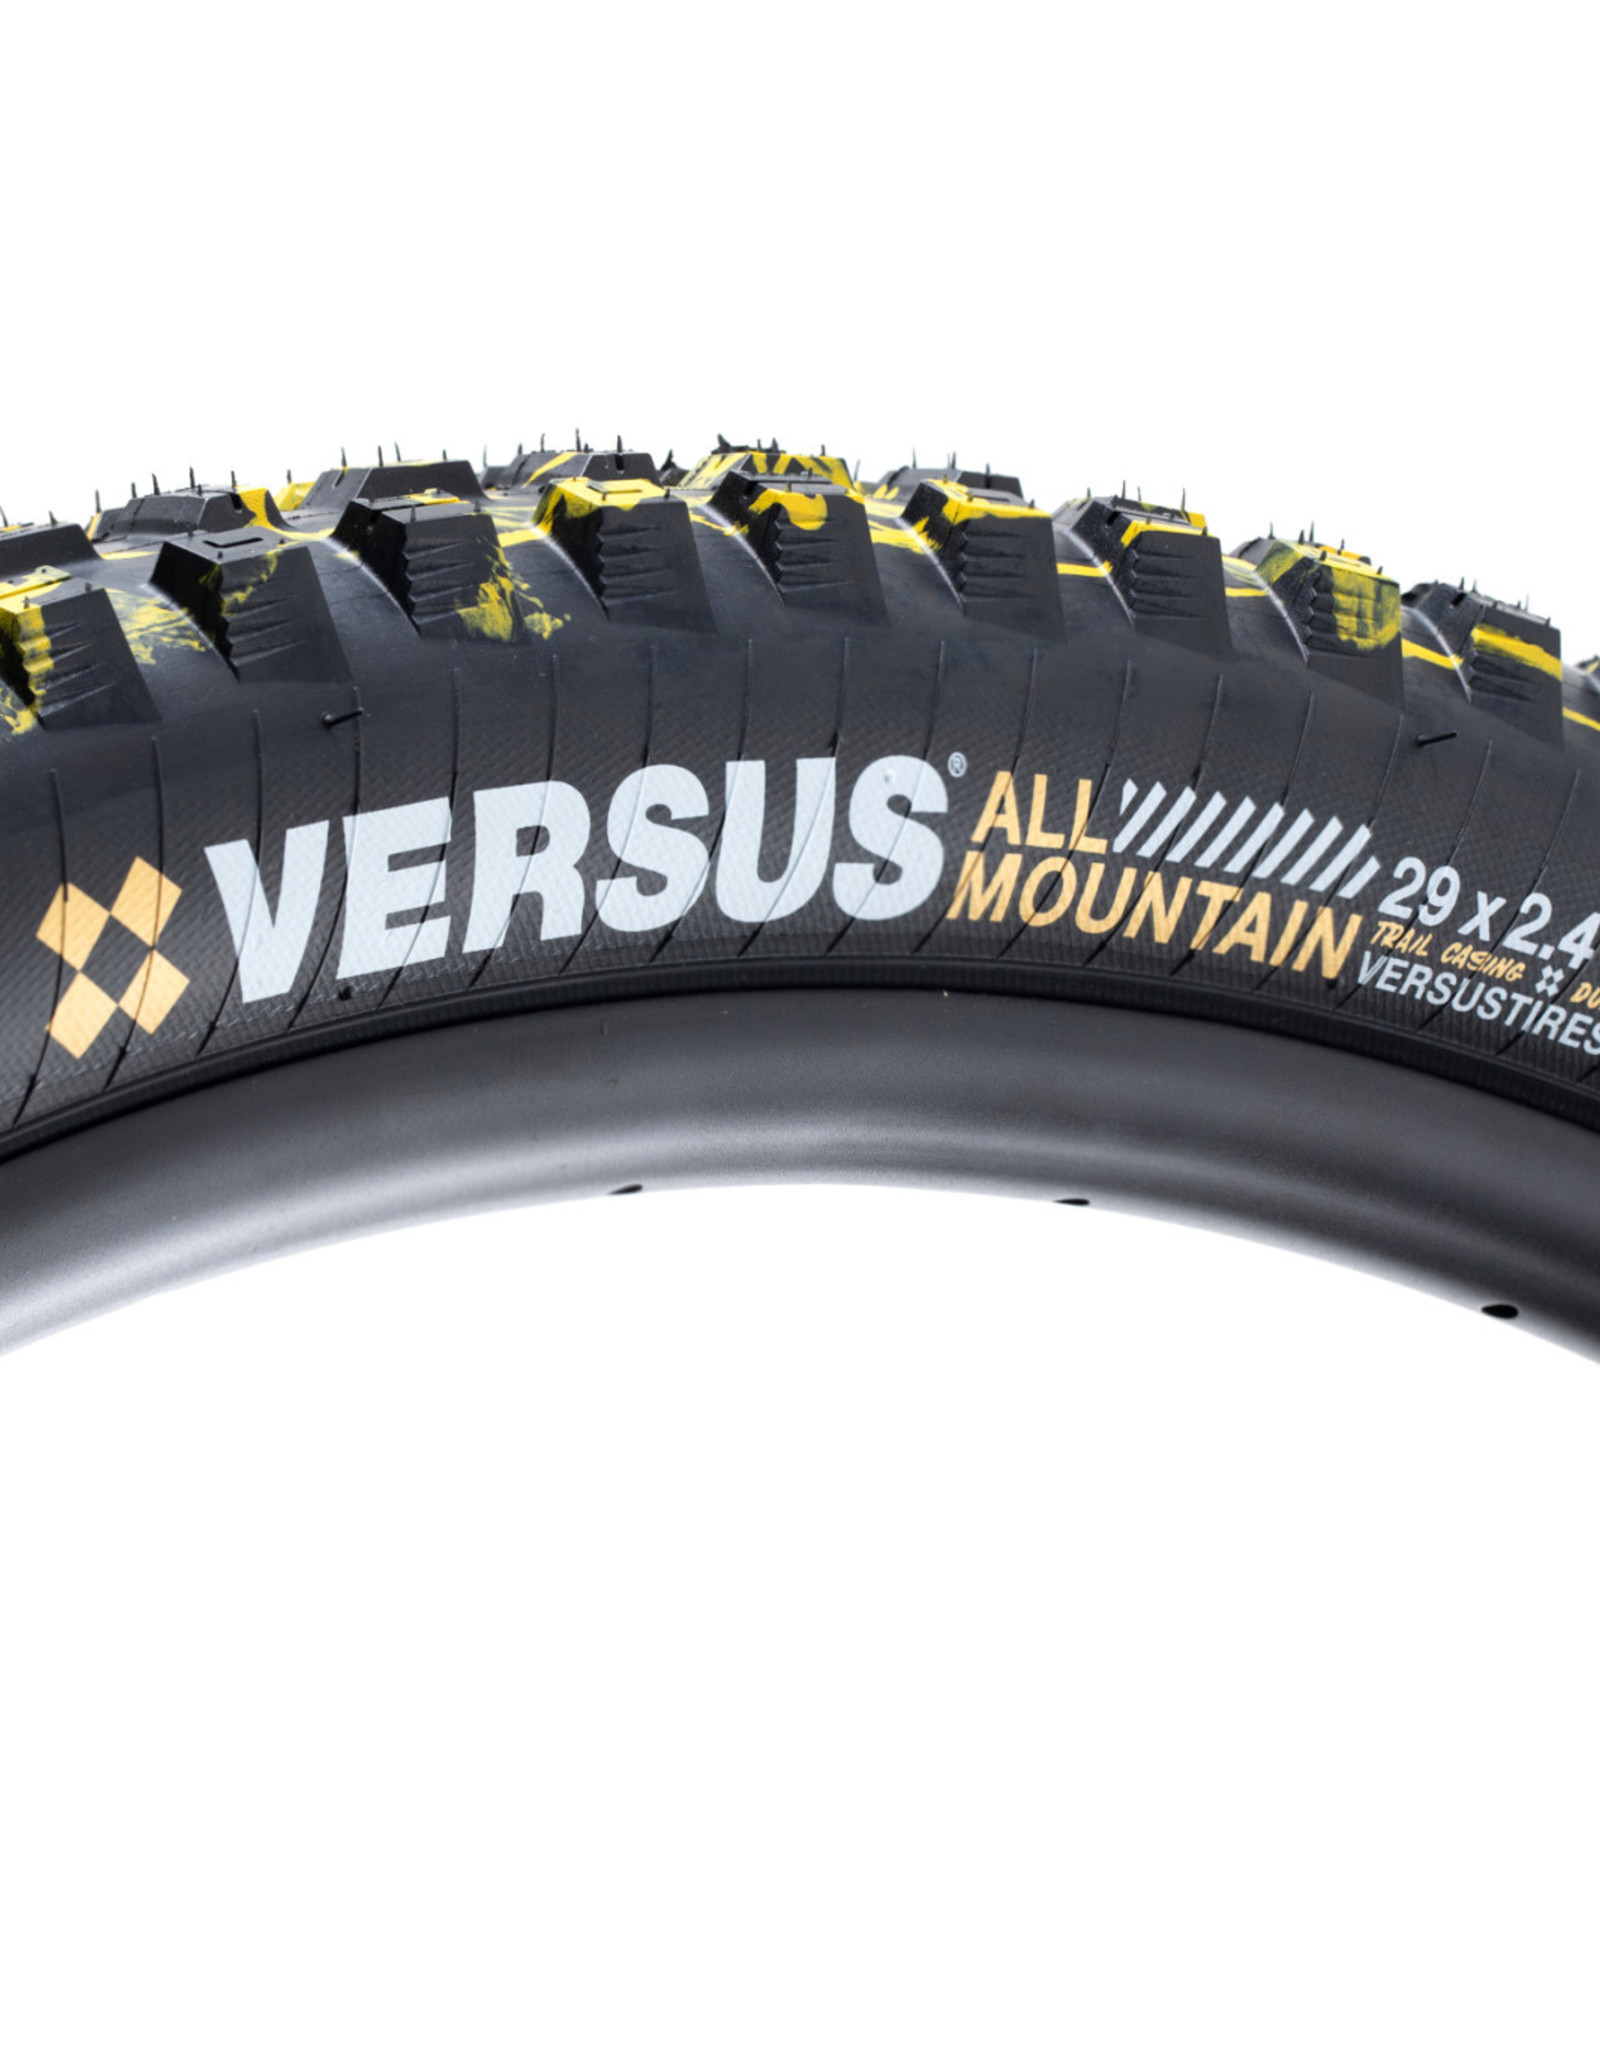 Versus Versus Tire All Mountain AM Gravity Casing